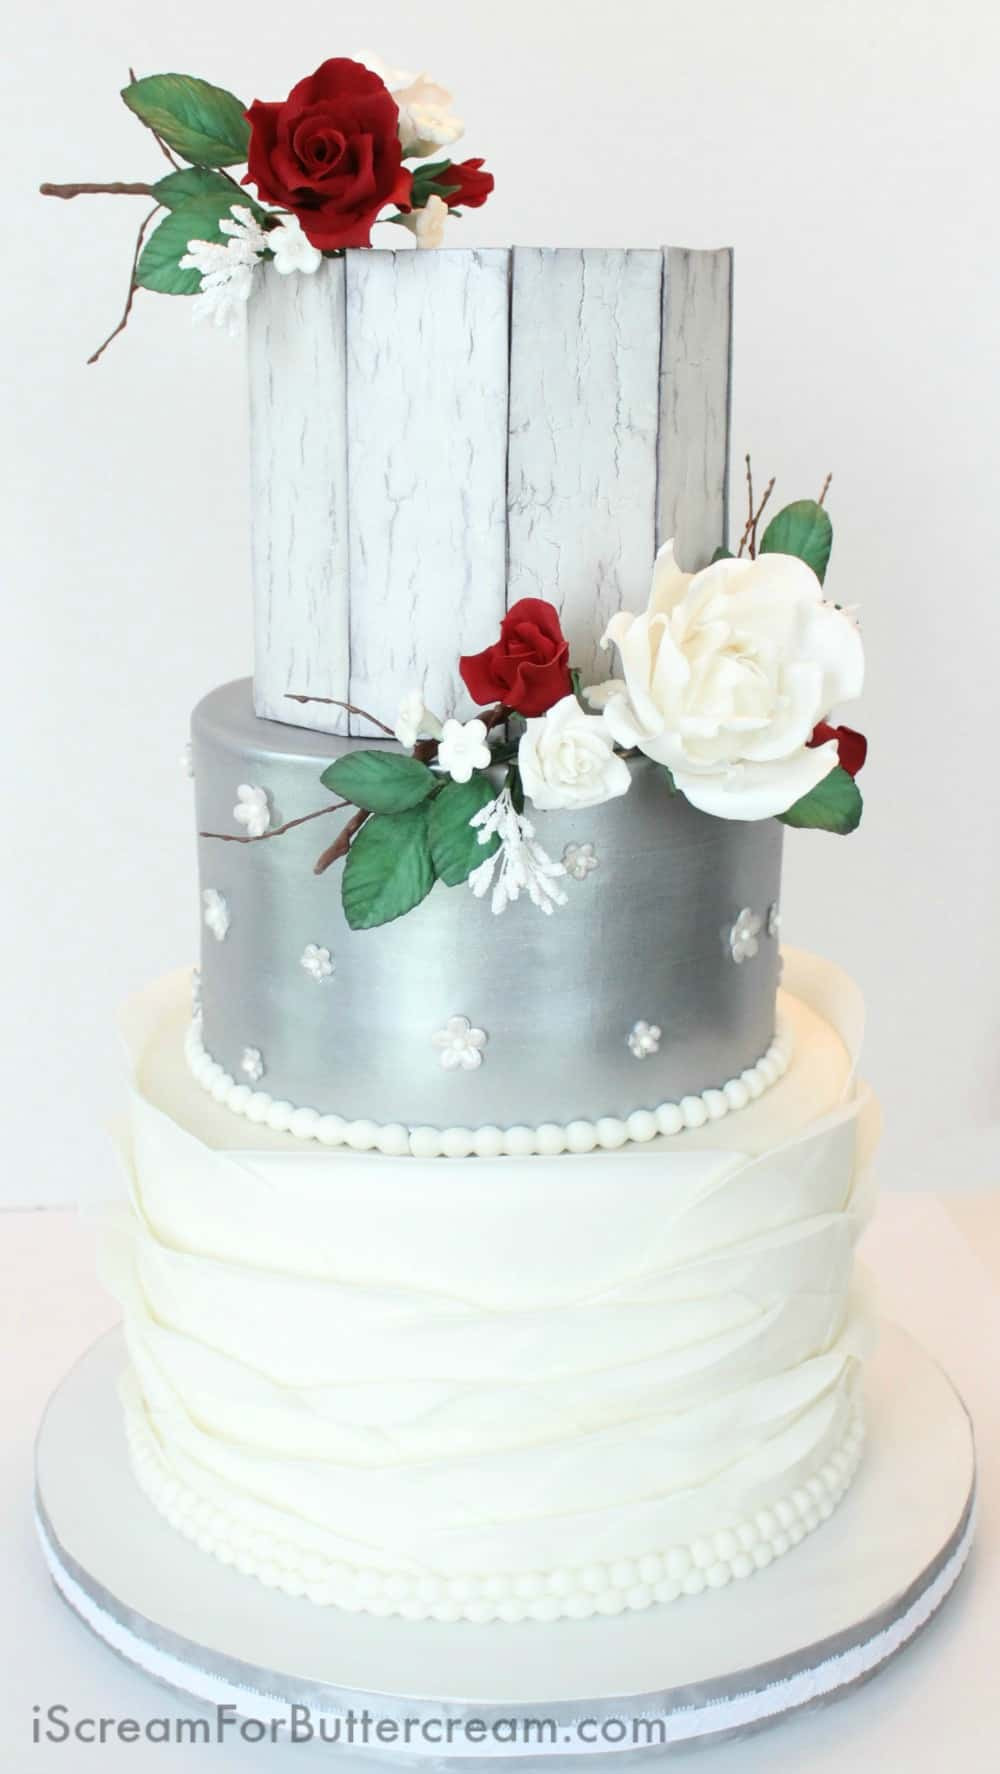 Elegant Buttercream Wedding Cakes  Elegant Rustic Silver Wedding Cake I Scream for Buttercream